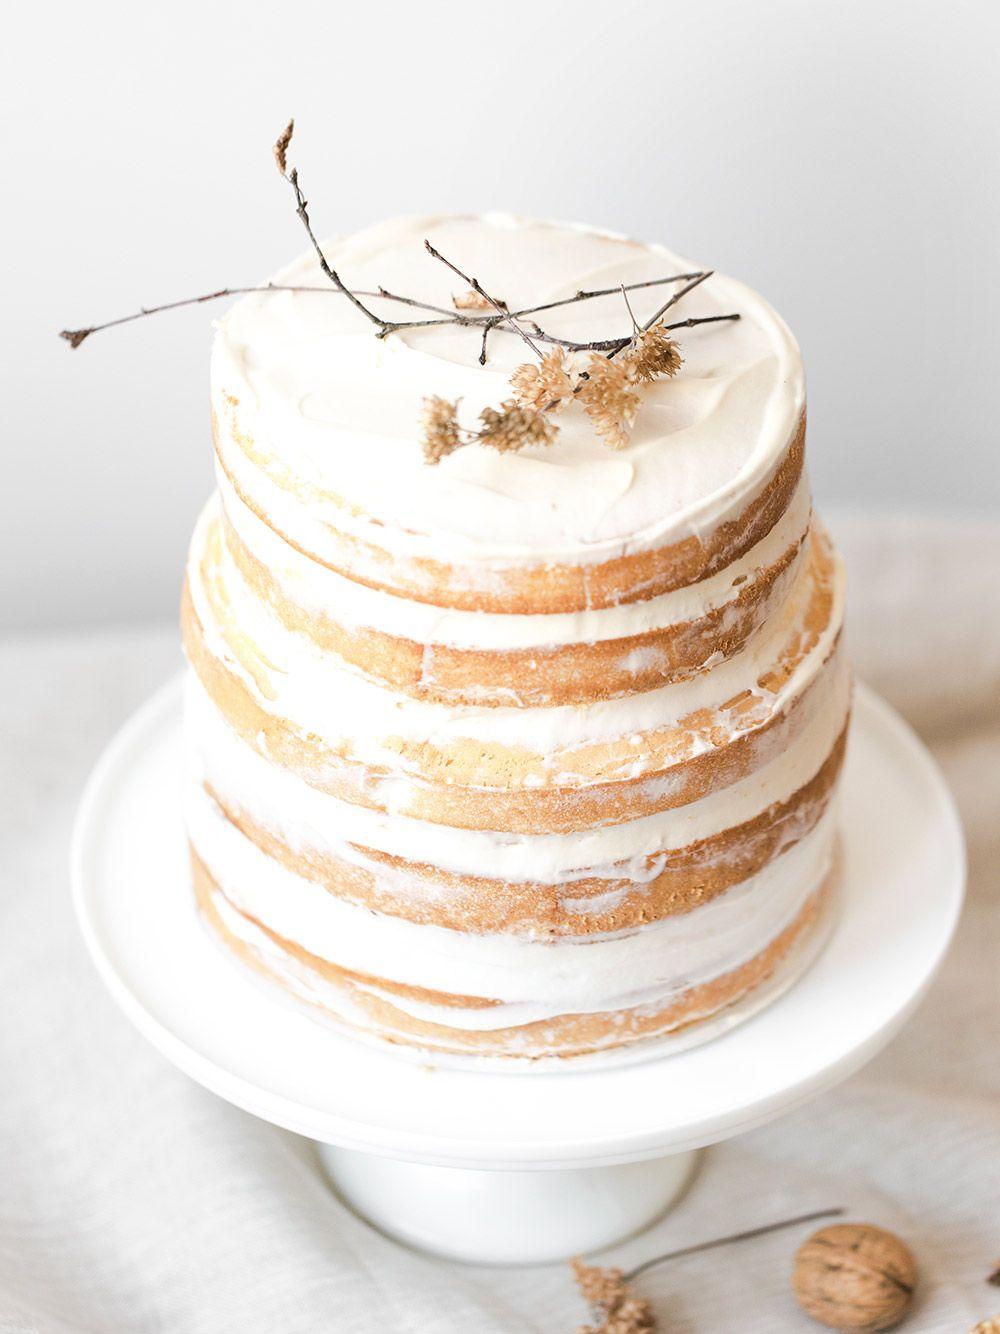 Nøgne kage eksotiske glutenfri, pasionsfrugter og kokosnød-7245